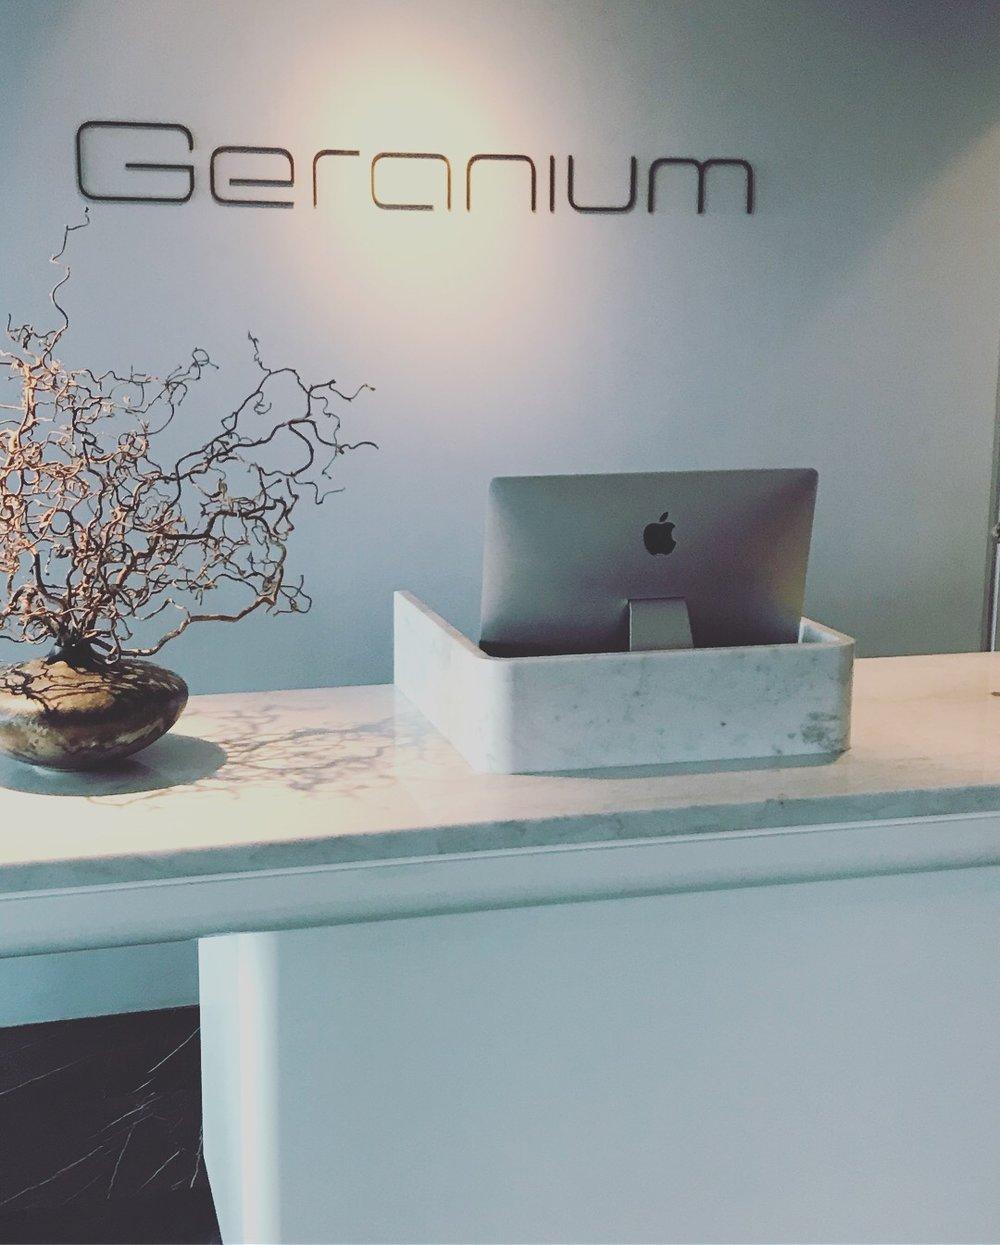 Geranium restaurant entrance